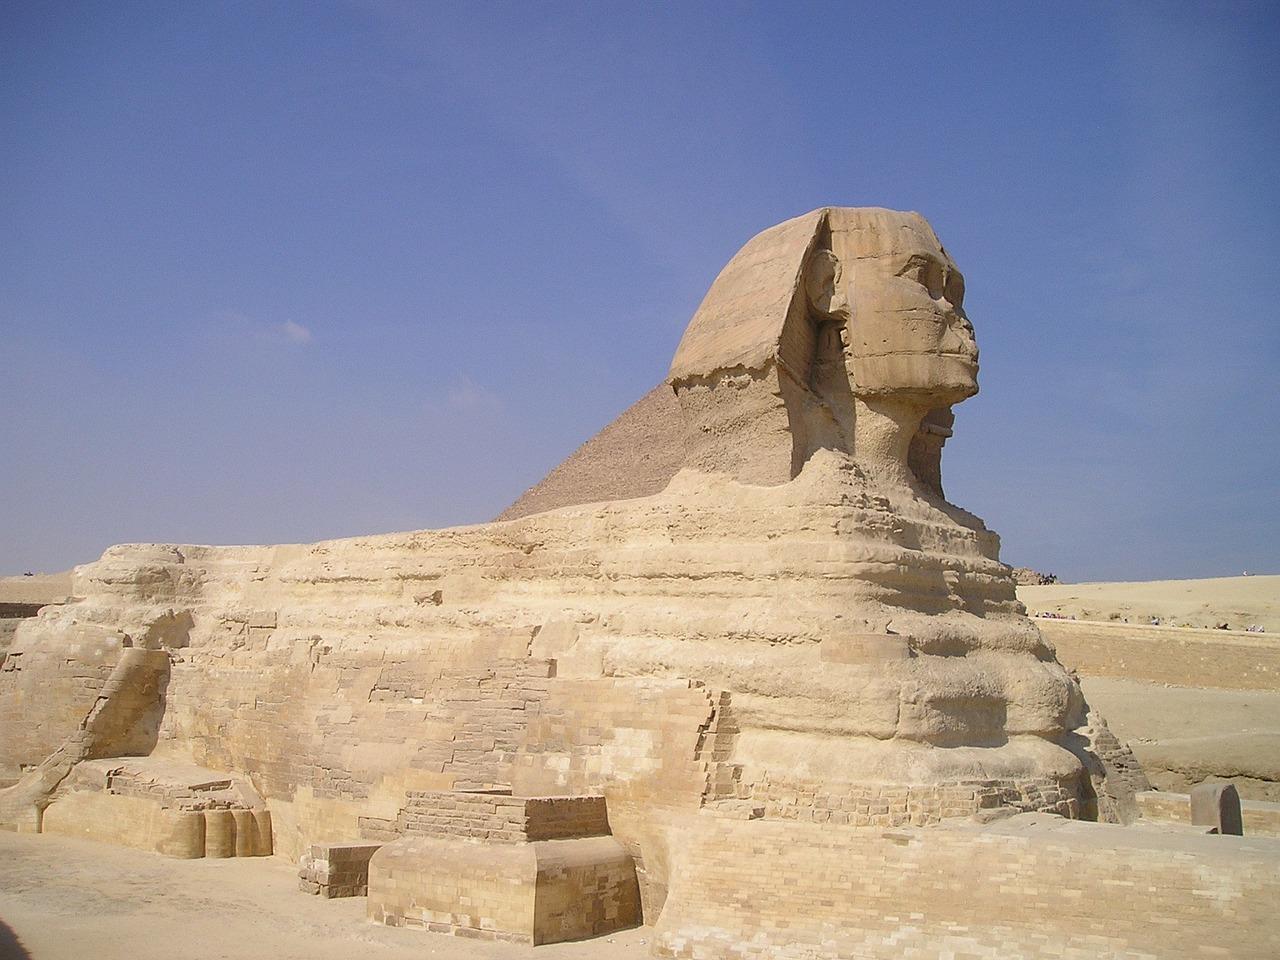 Sfinx van Gizeh